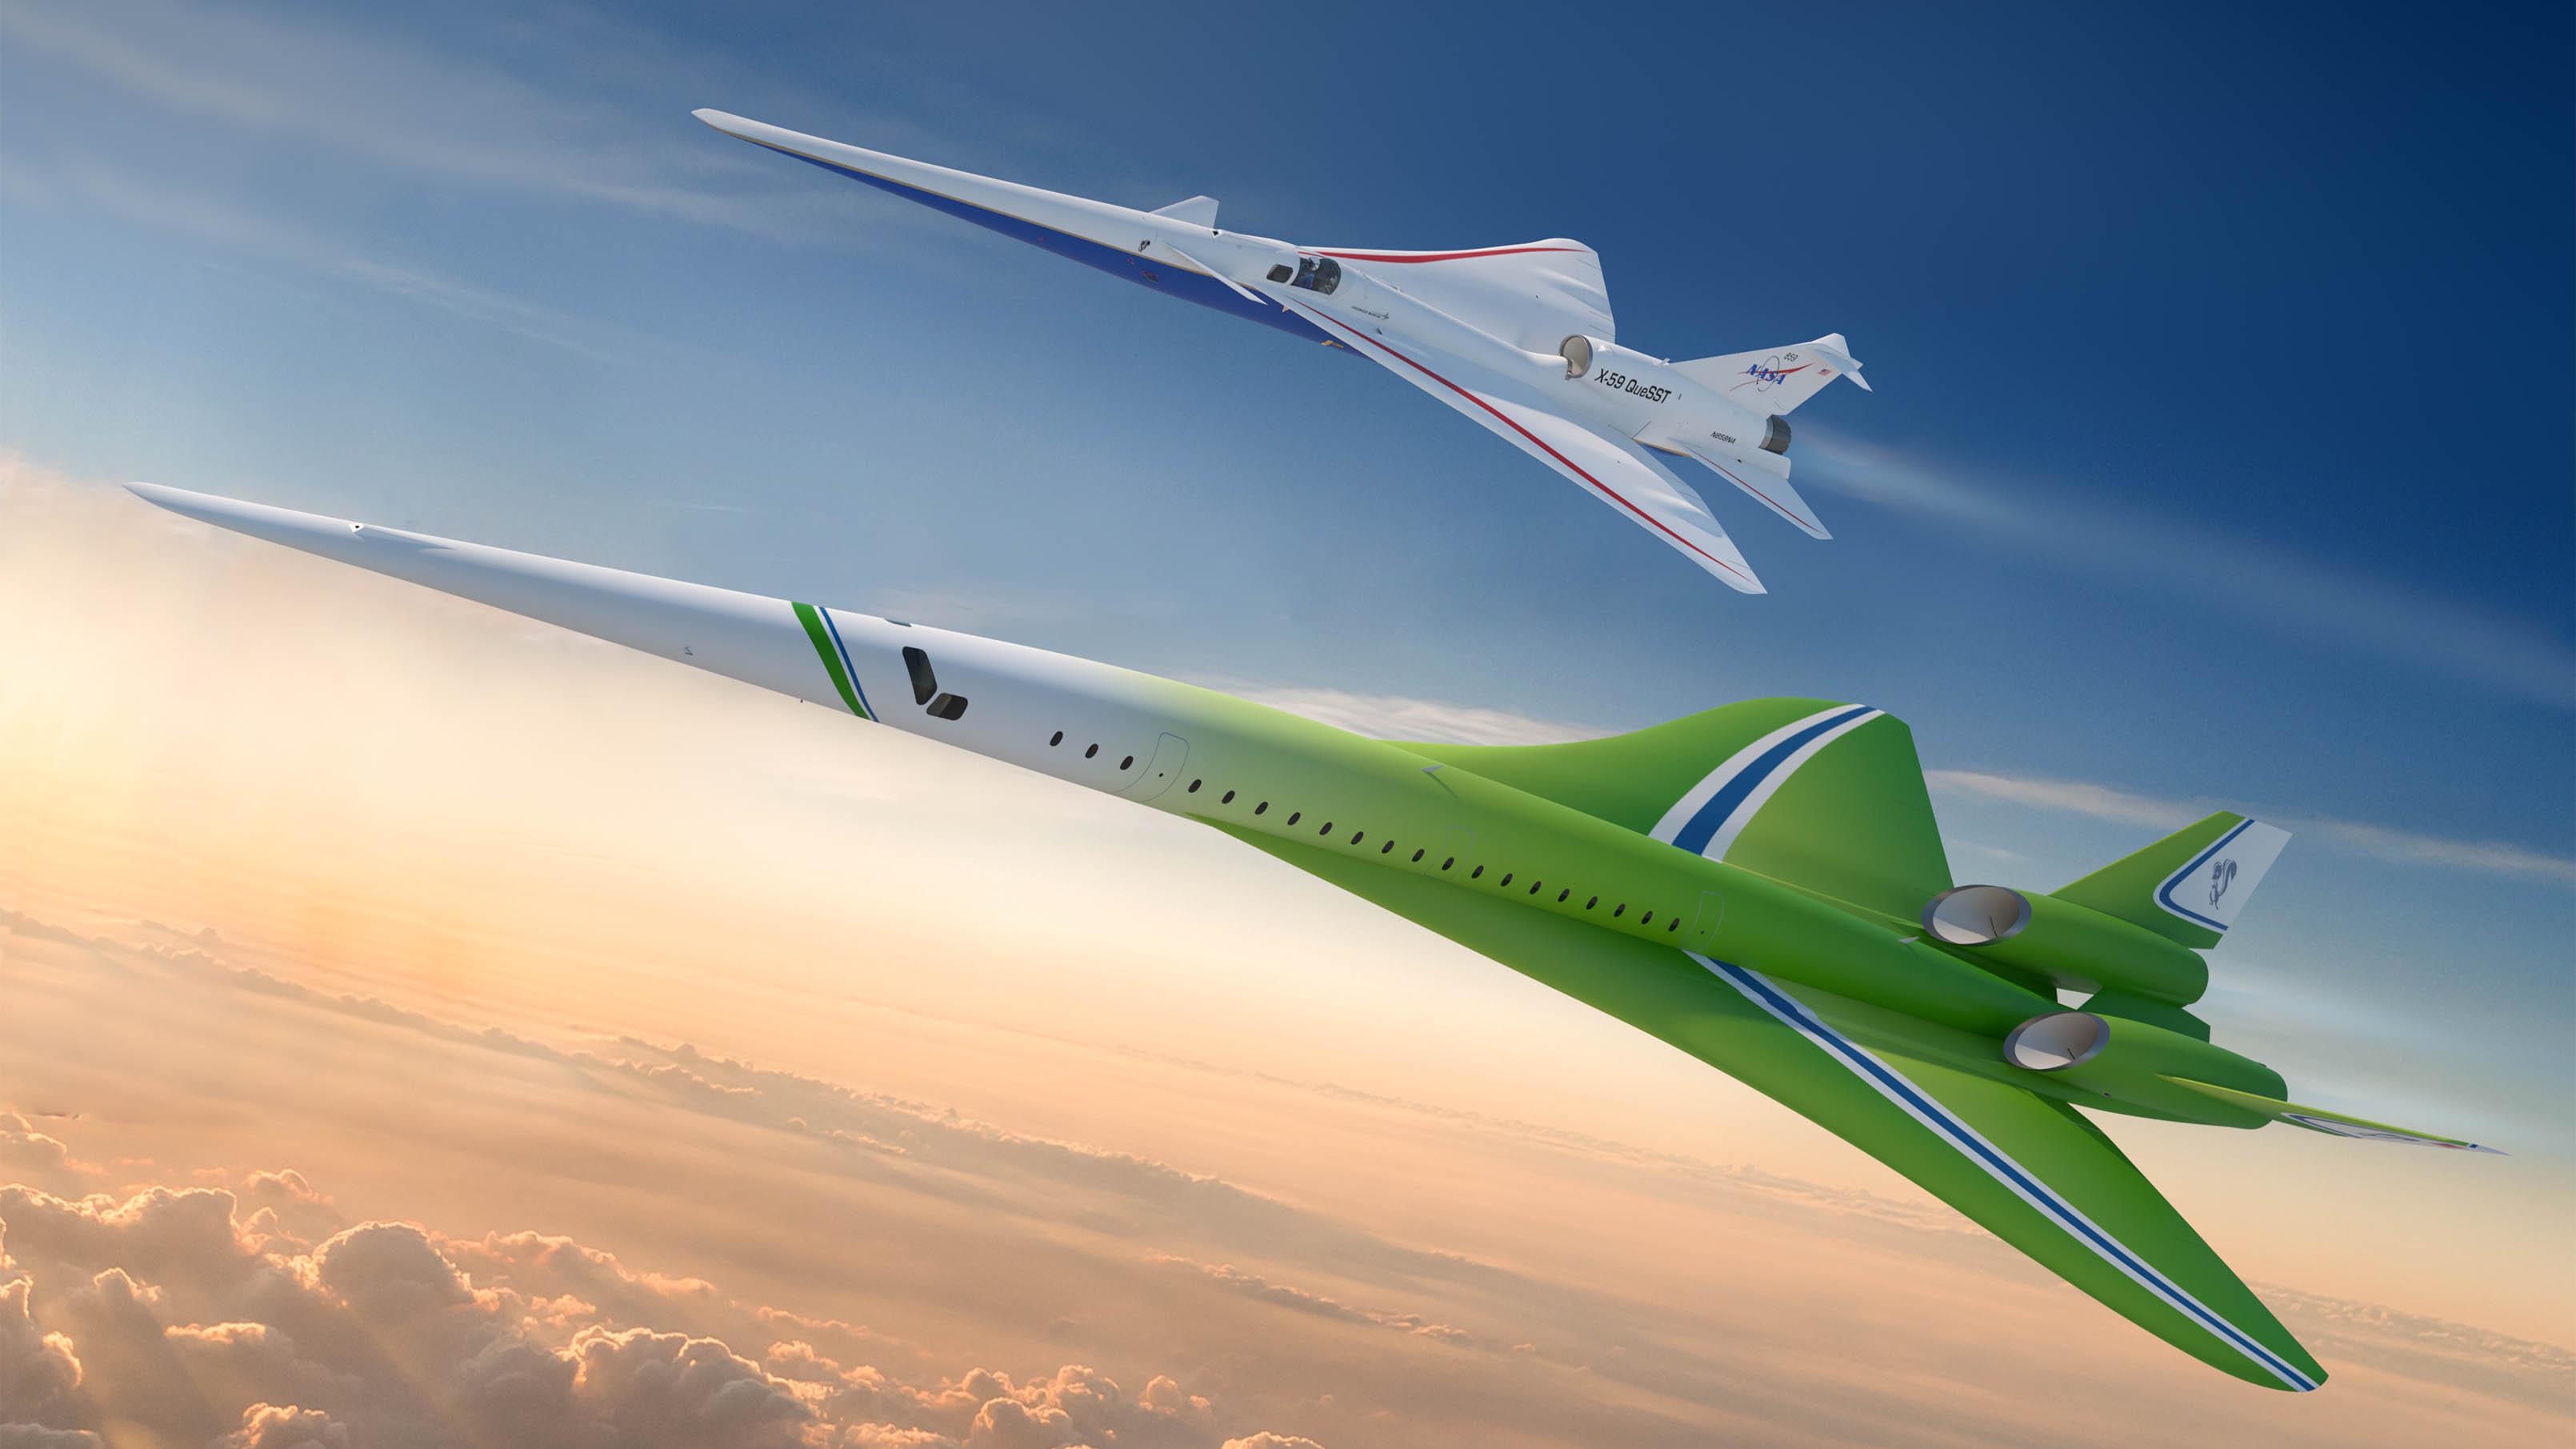 Lockheed Martin unveils plans for quiet supersonic passenger